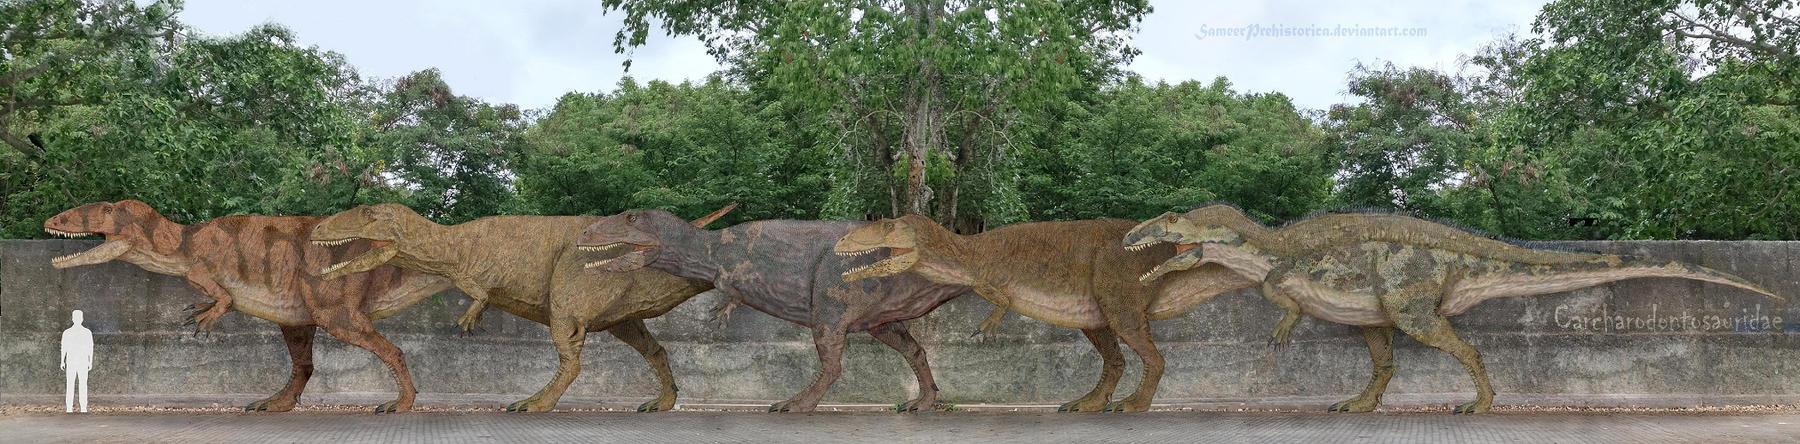 Carcharodontosauridae by SameerPrehistorica